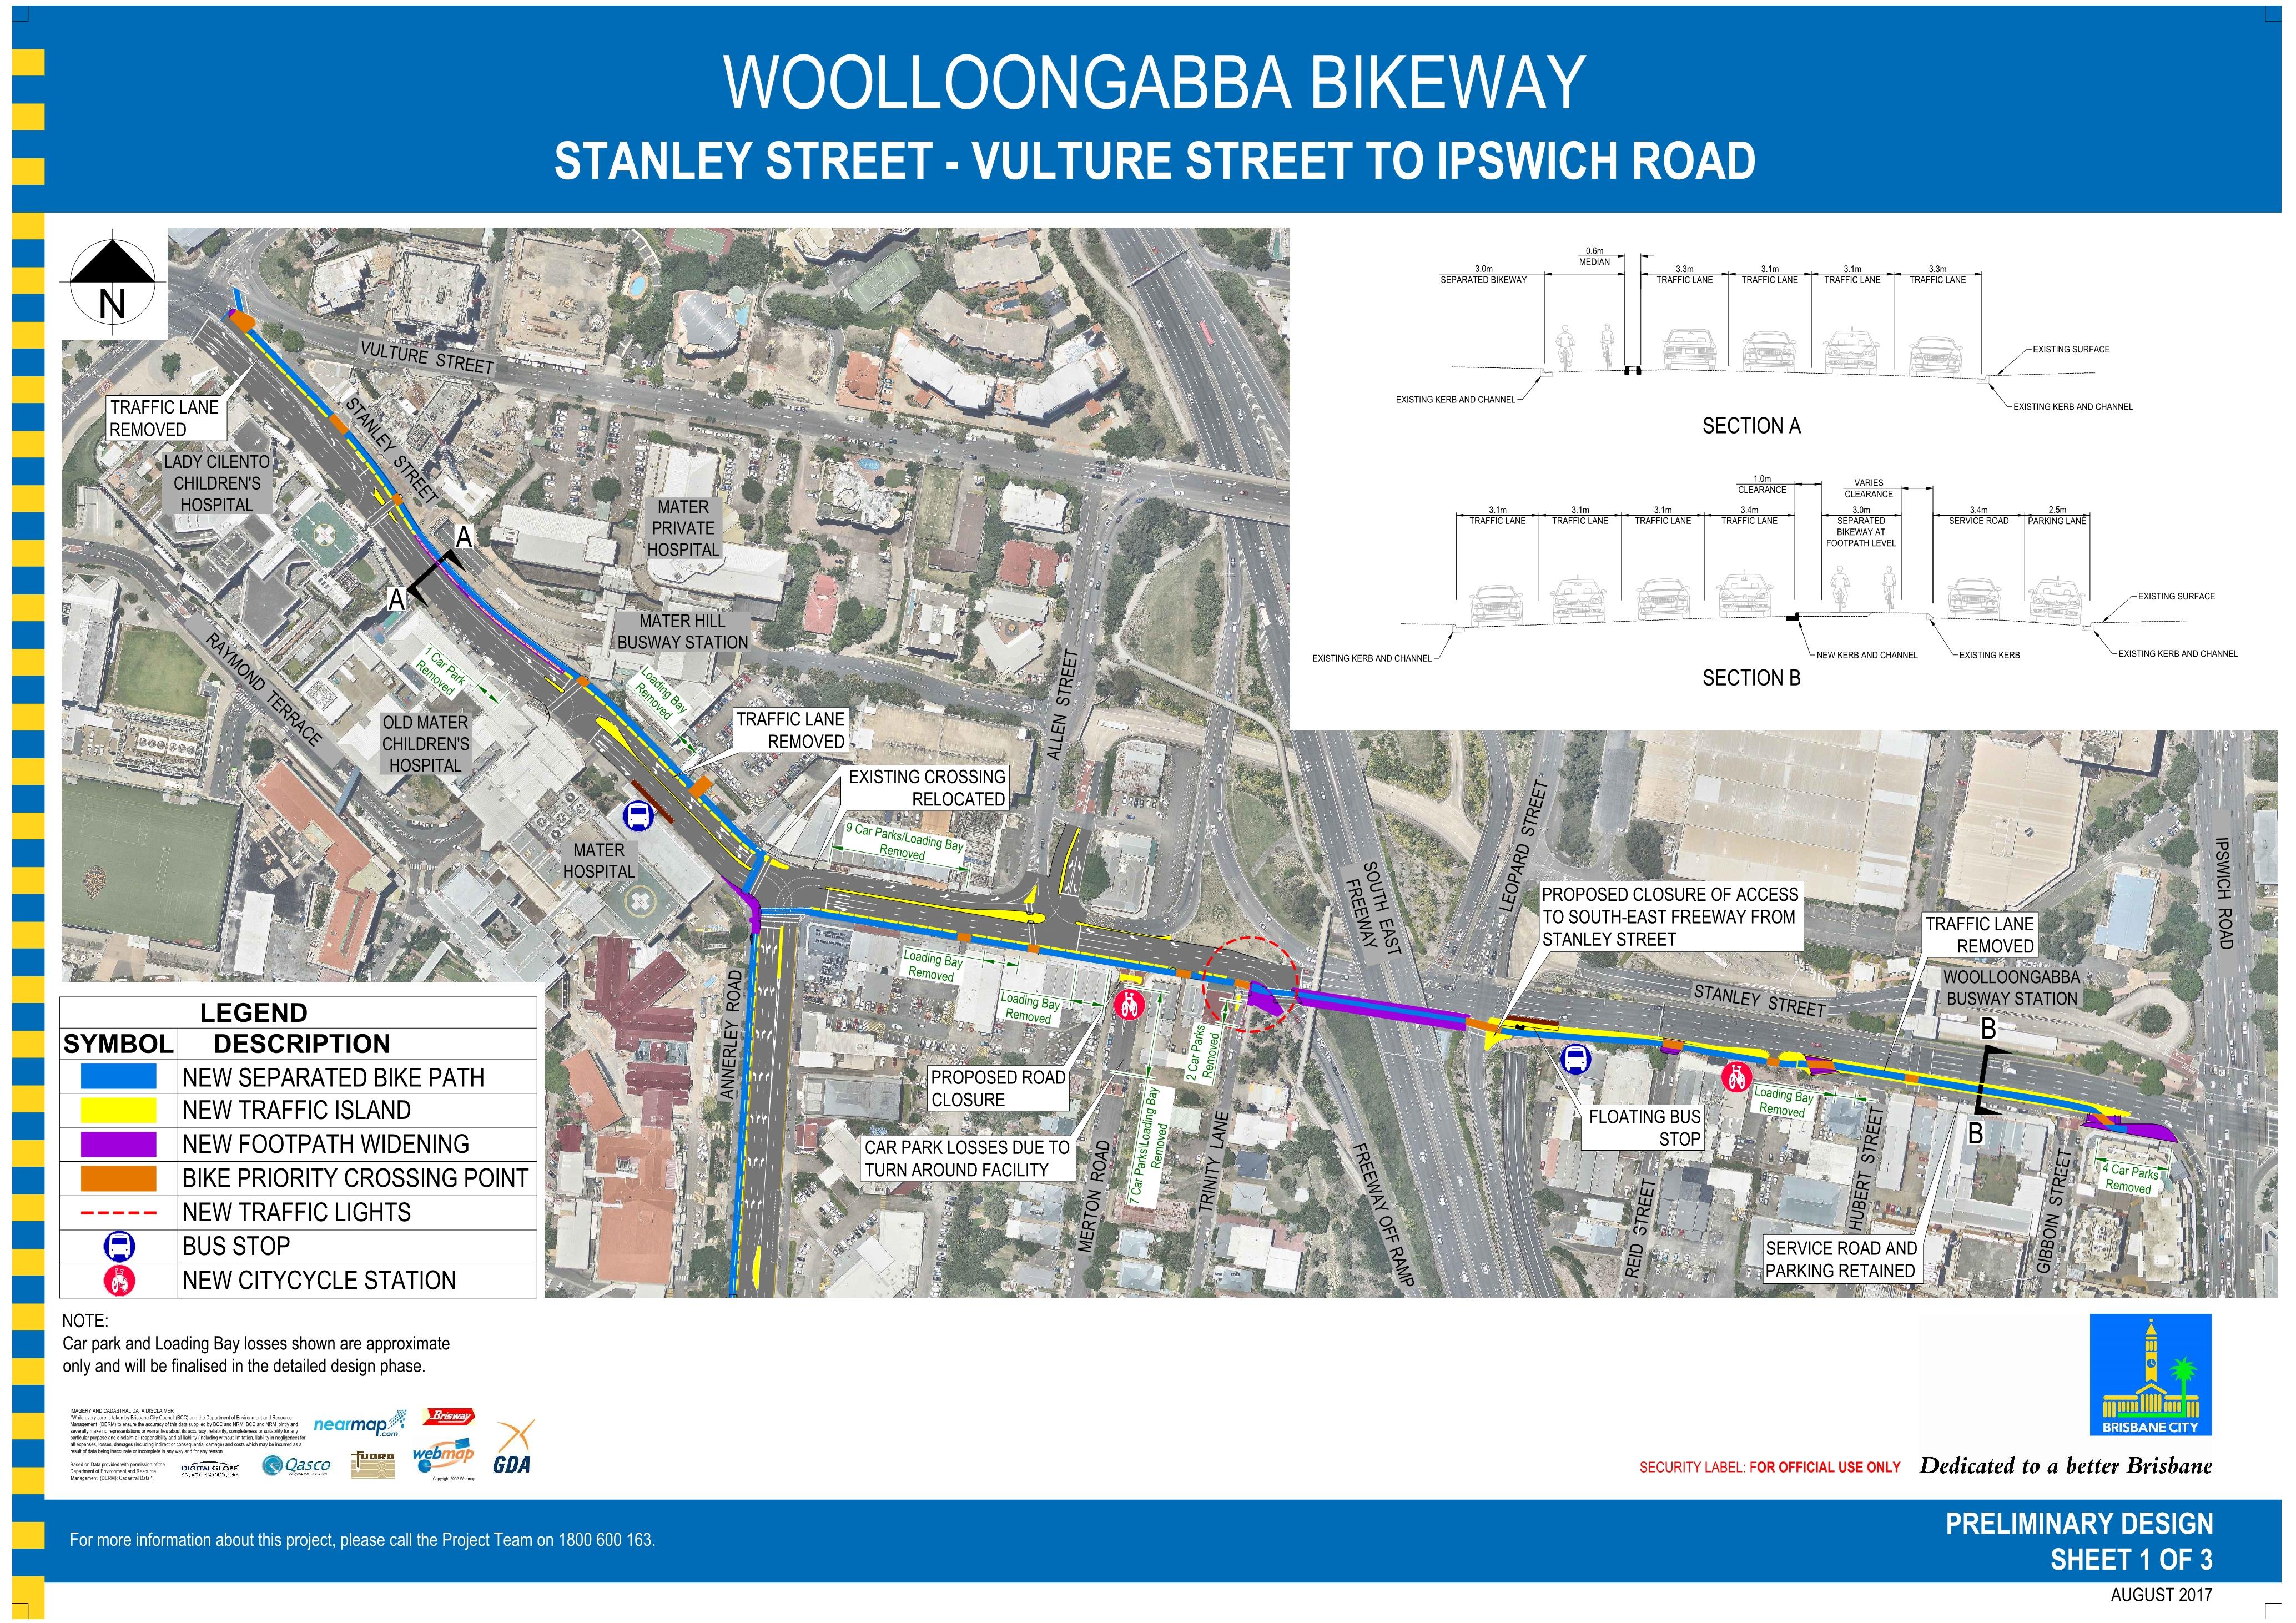 small__wooloongabba_bikeway_project_plan_-_stanley_street_-_vulture_street_to_ipswich_road1.jpg